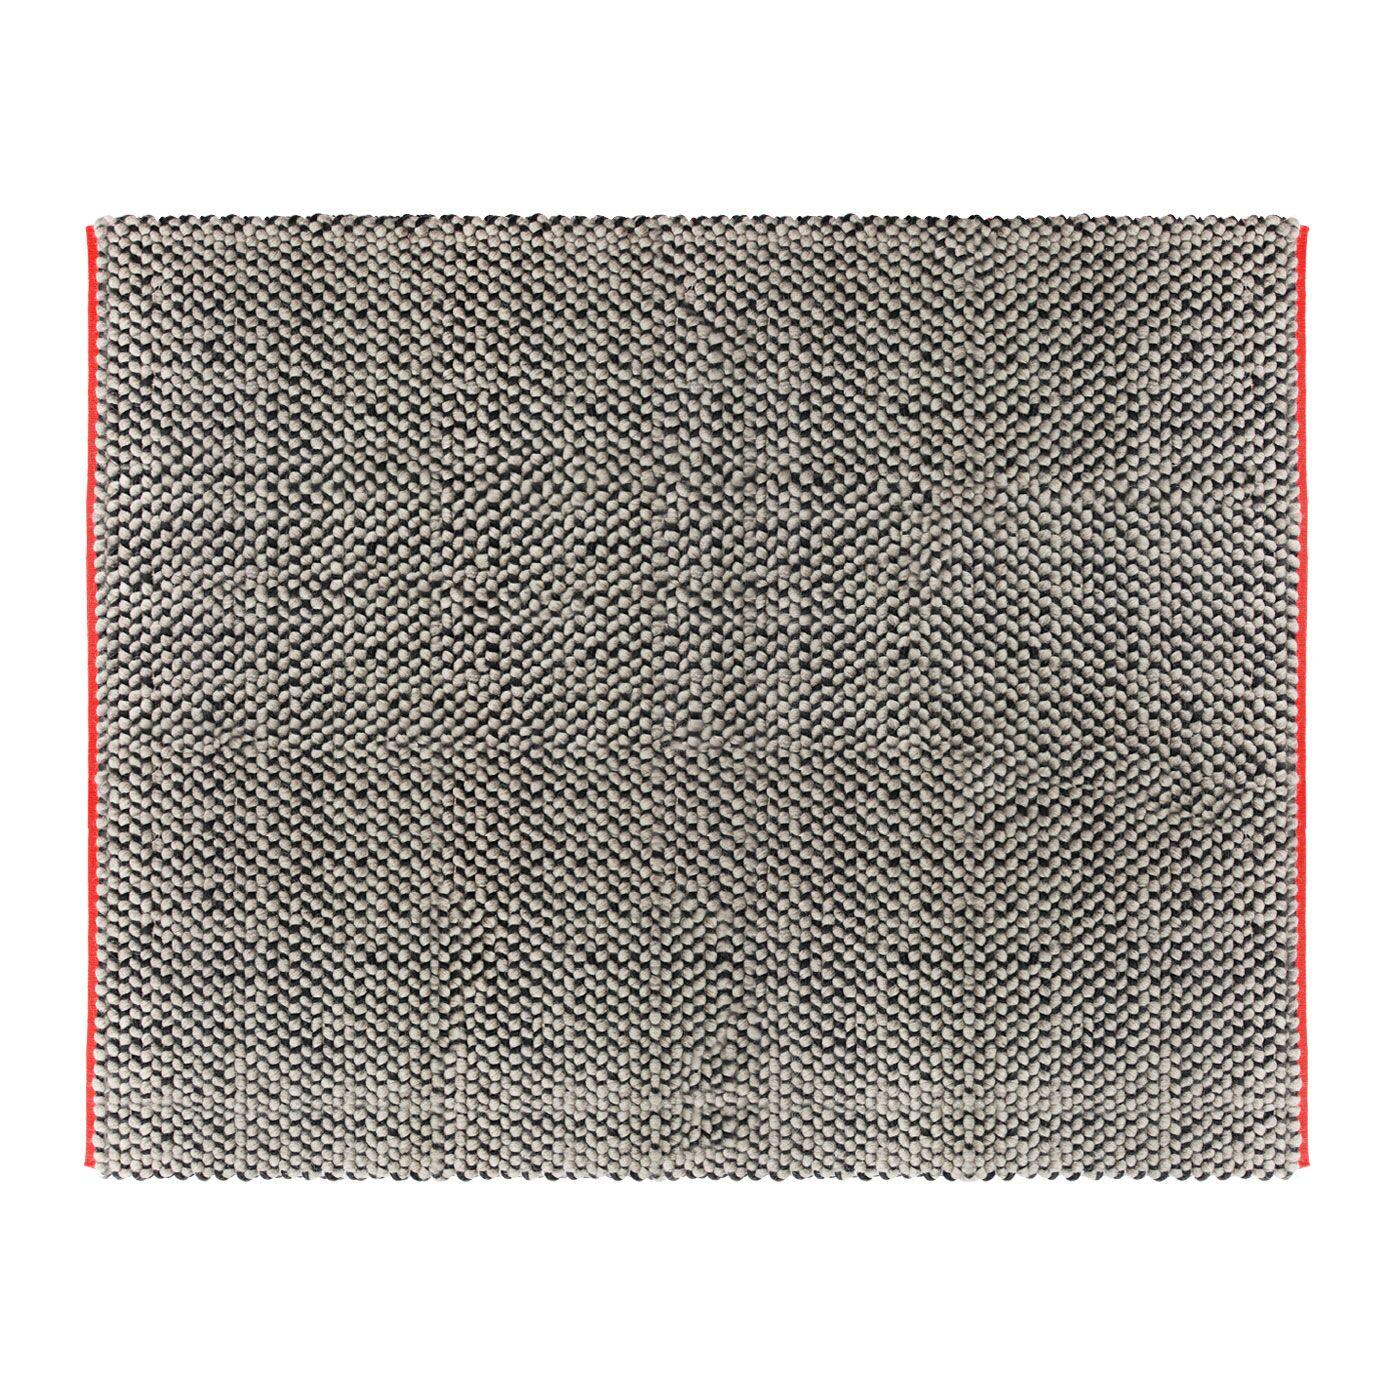 Dollop Grey Area Rug Rug Size: 8' x 10'